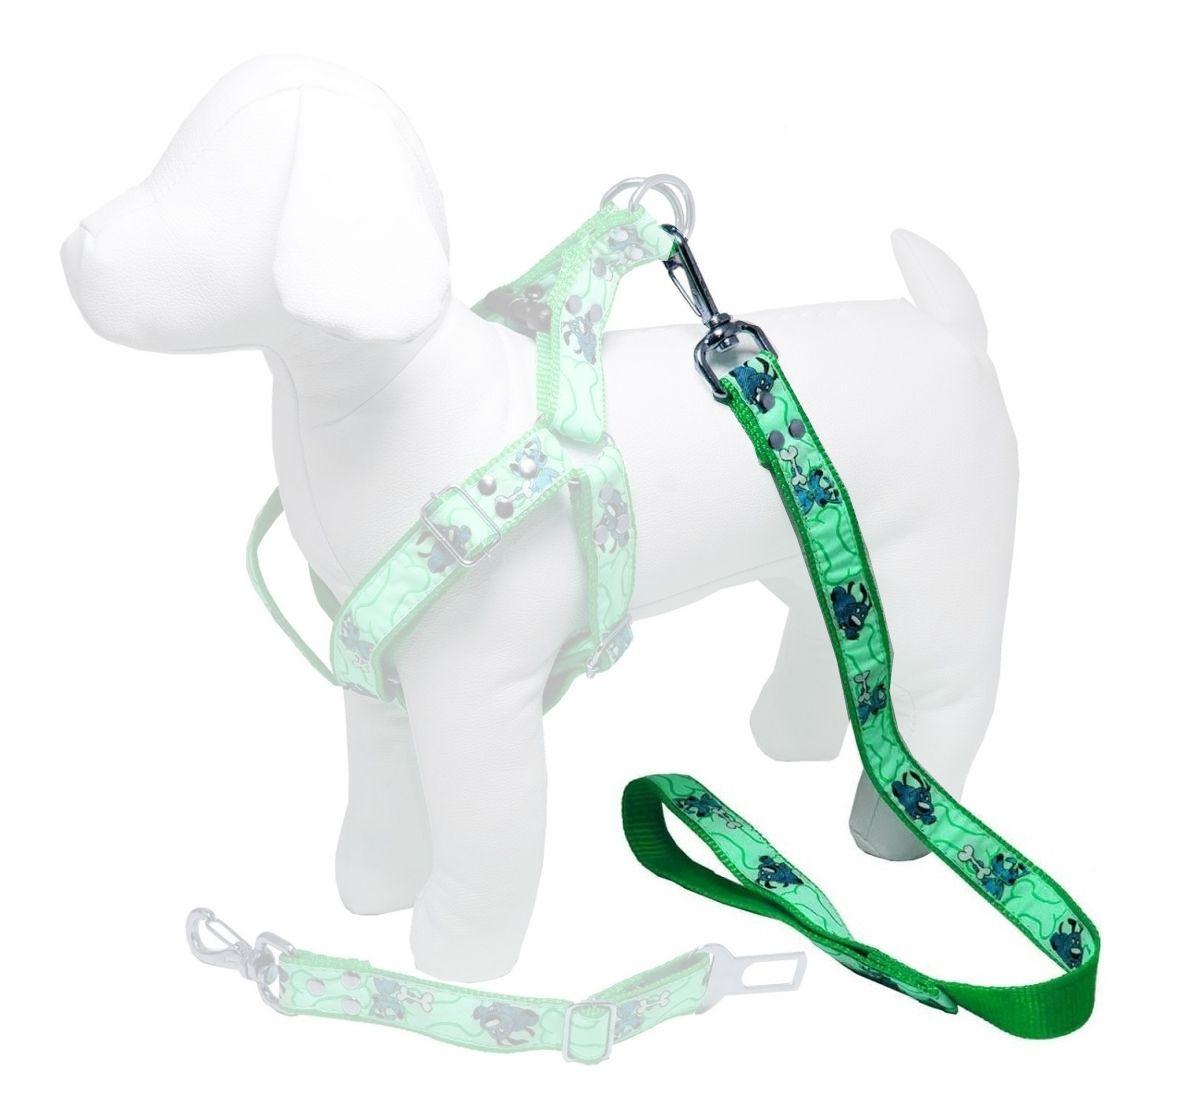 Guia de 1 Metro Resistente Para Cachorros de Menor Porte - Cor Verde